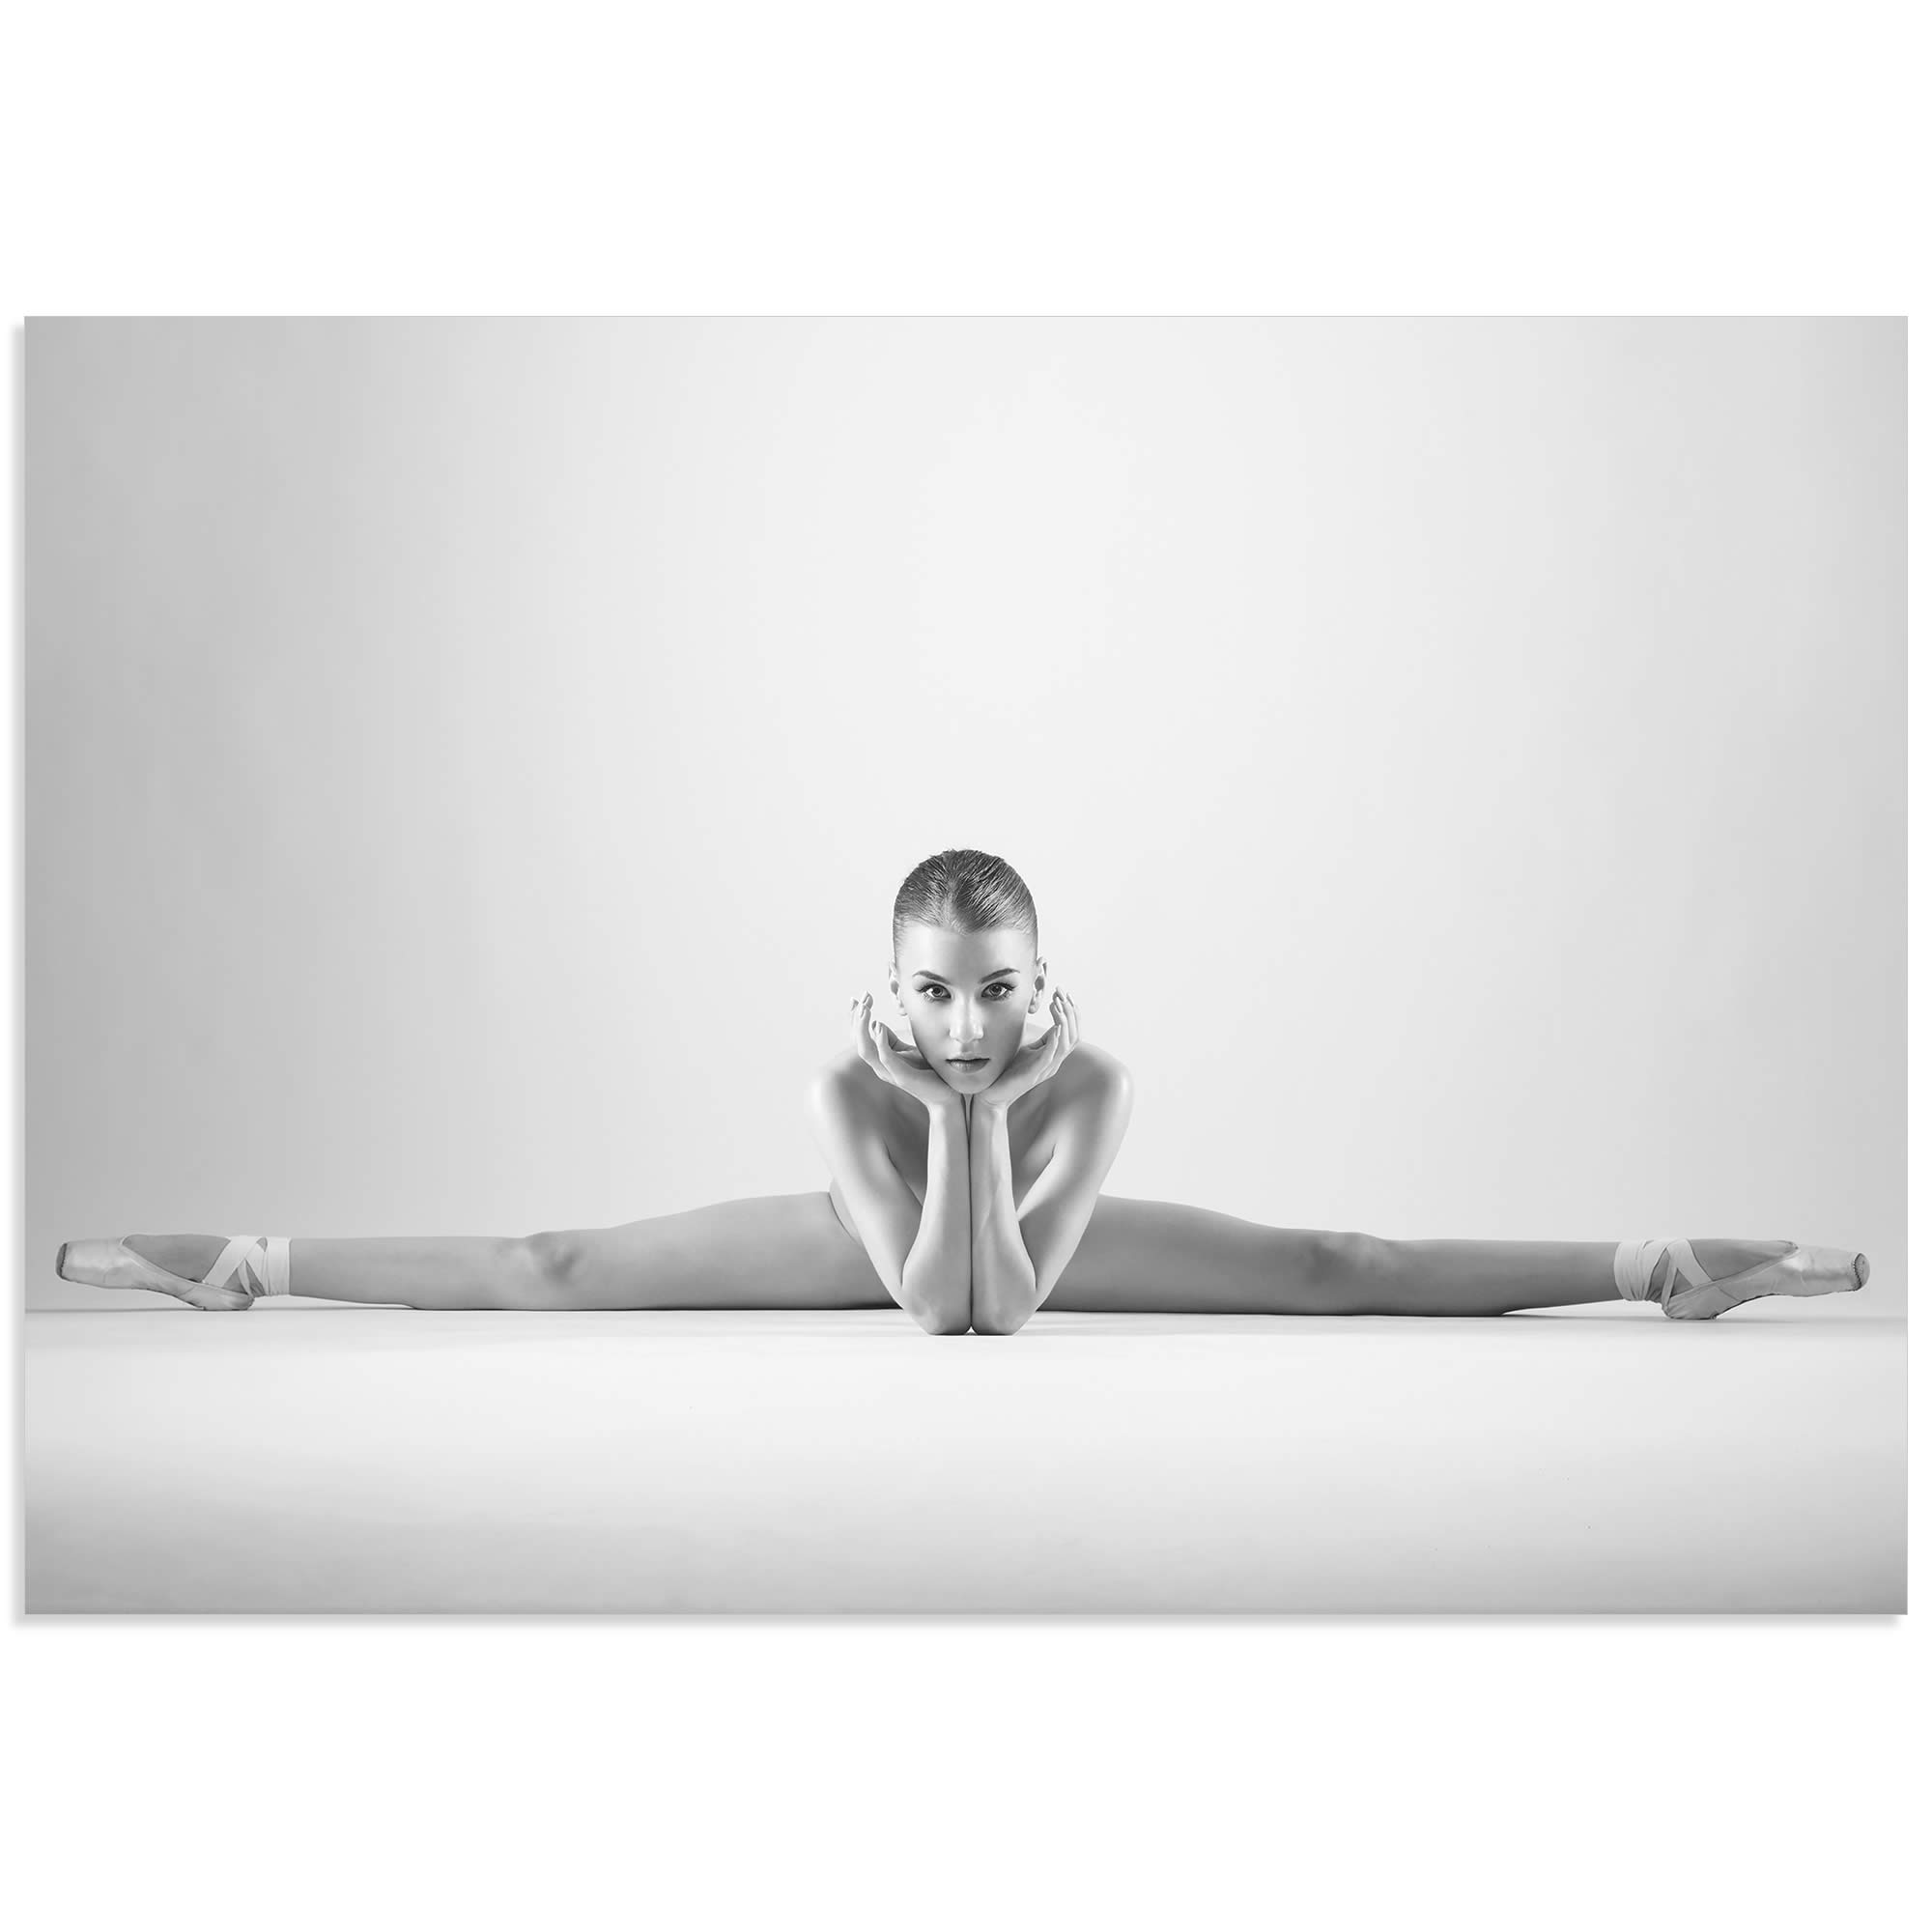 Ballerina Splits by Arkadiusz Branicki - Classy Nude Photography on Metal or Acrylic